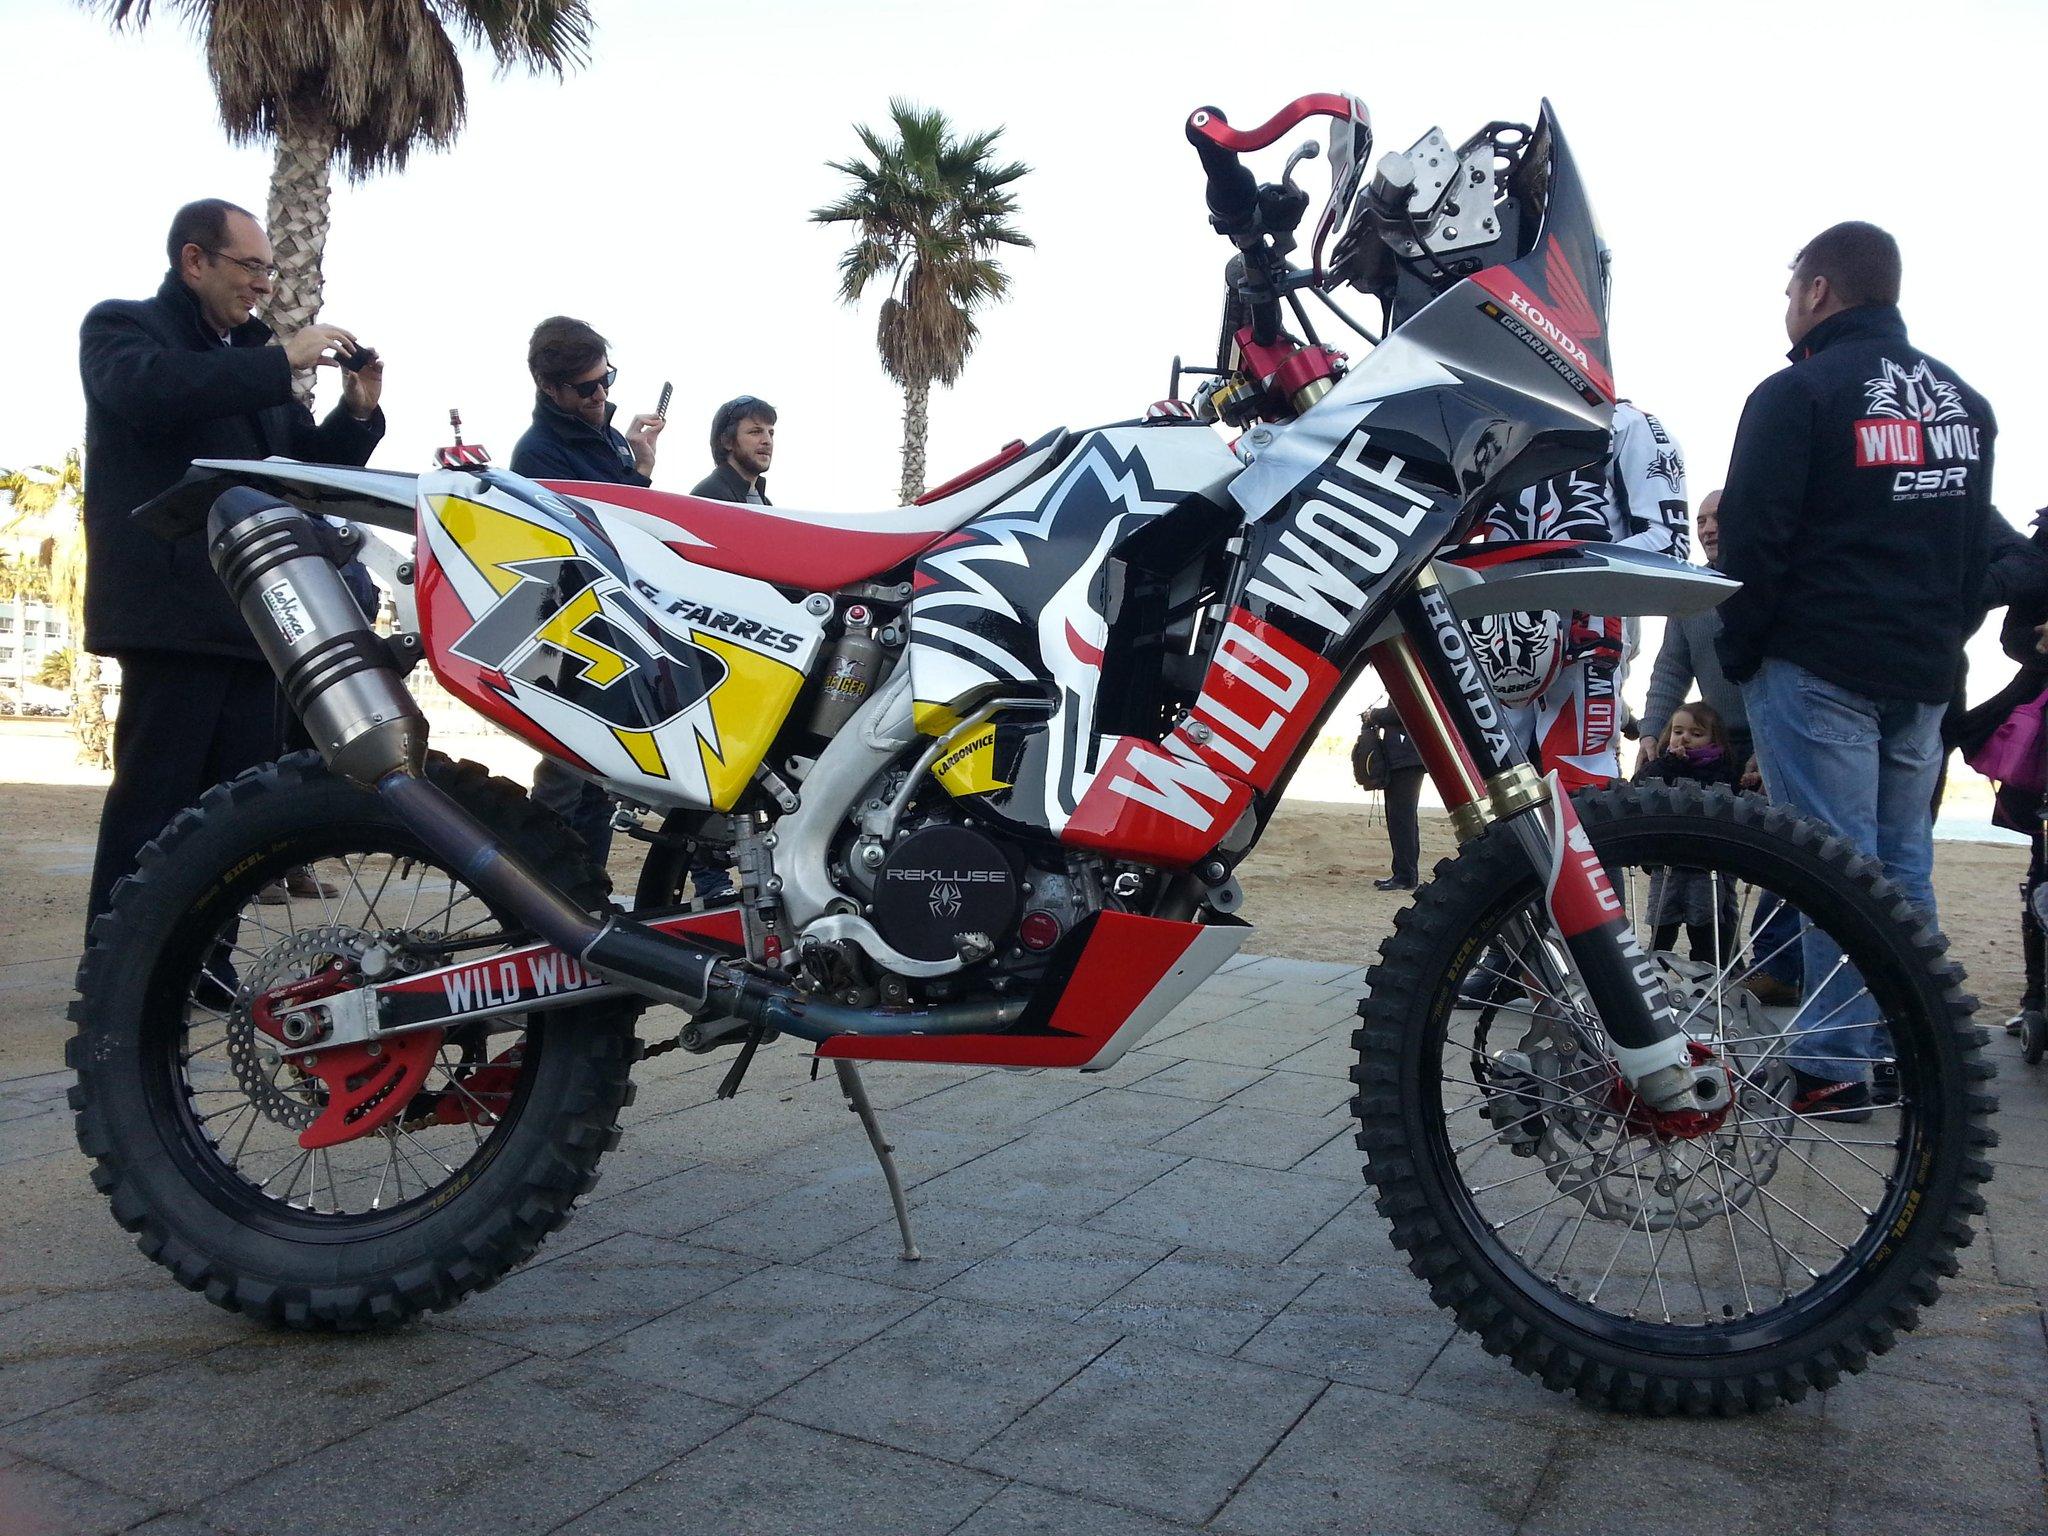 Rallye Raid Dakar Peru - Argentina - Chile 2013 [5-20 Enero] - Página 7 A-ZgSiiCQAAXtI9